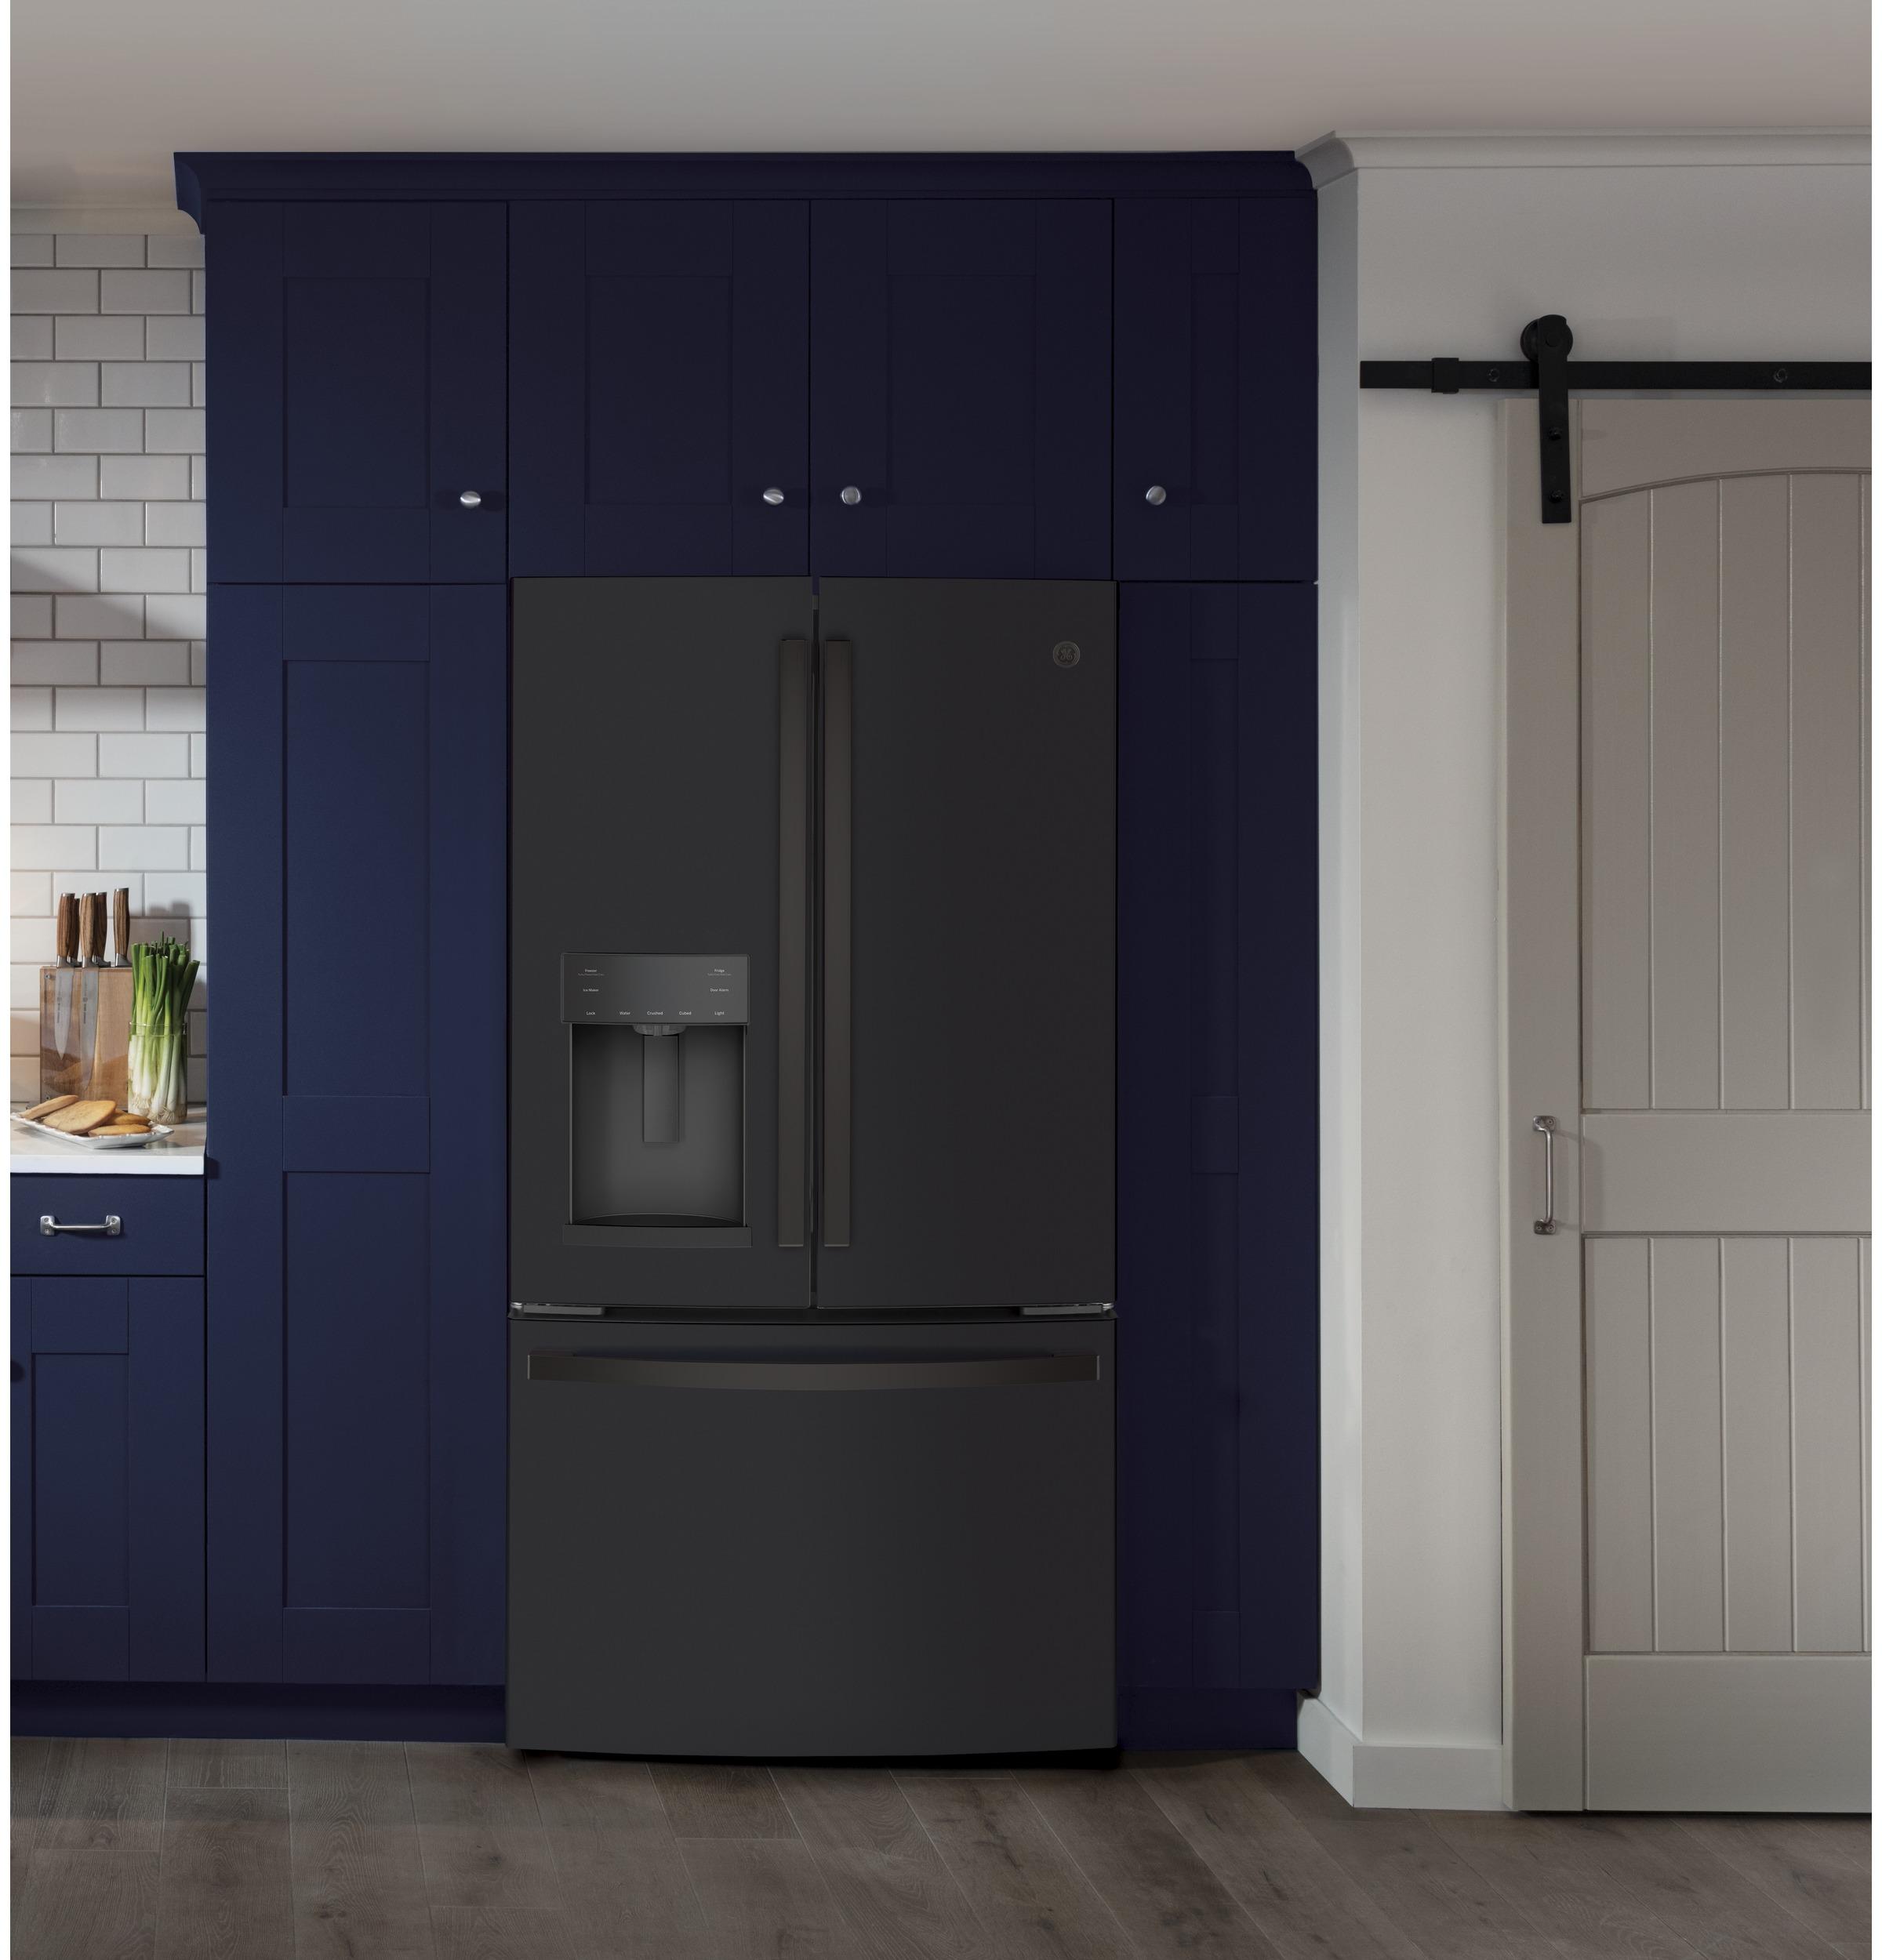 Model: GYE22GENDS | GE GE® ENERGY STAR® 22.1 Cu. Ft. Counter-Depth French-Door Refrigerator